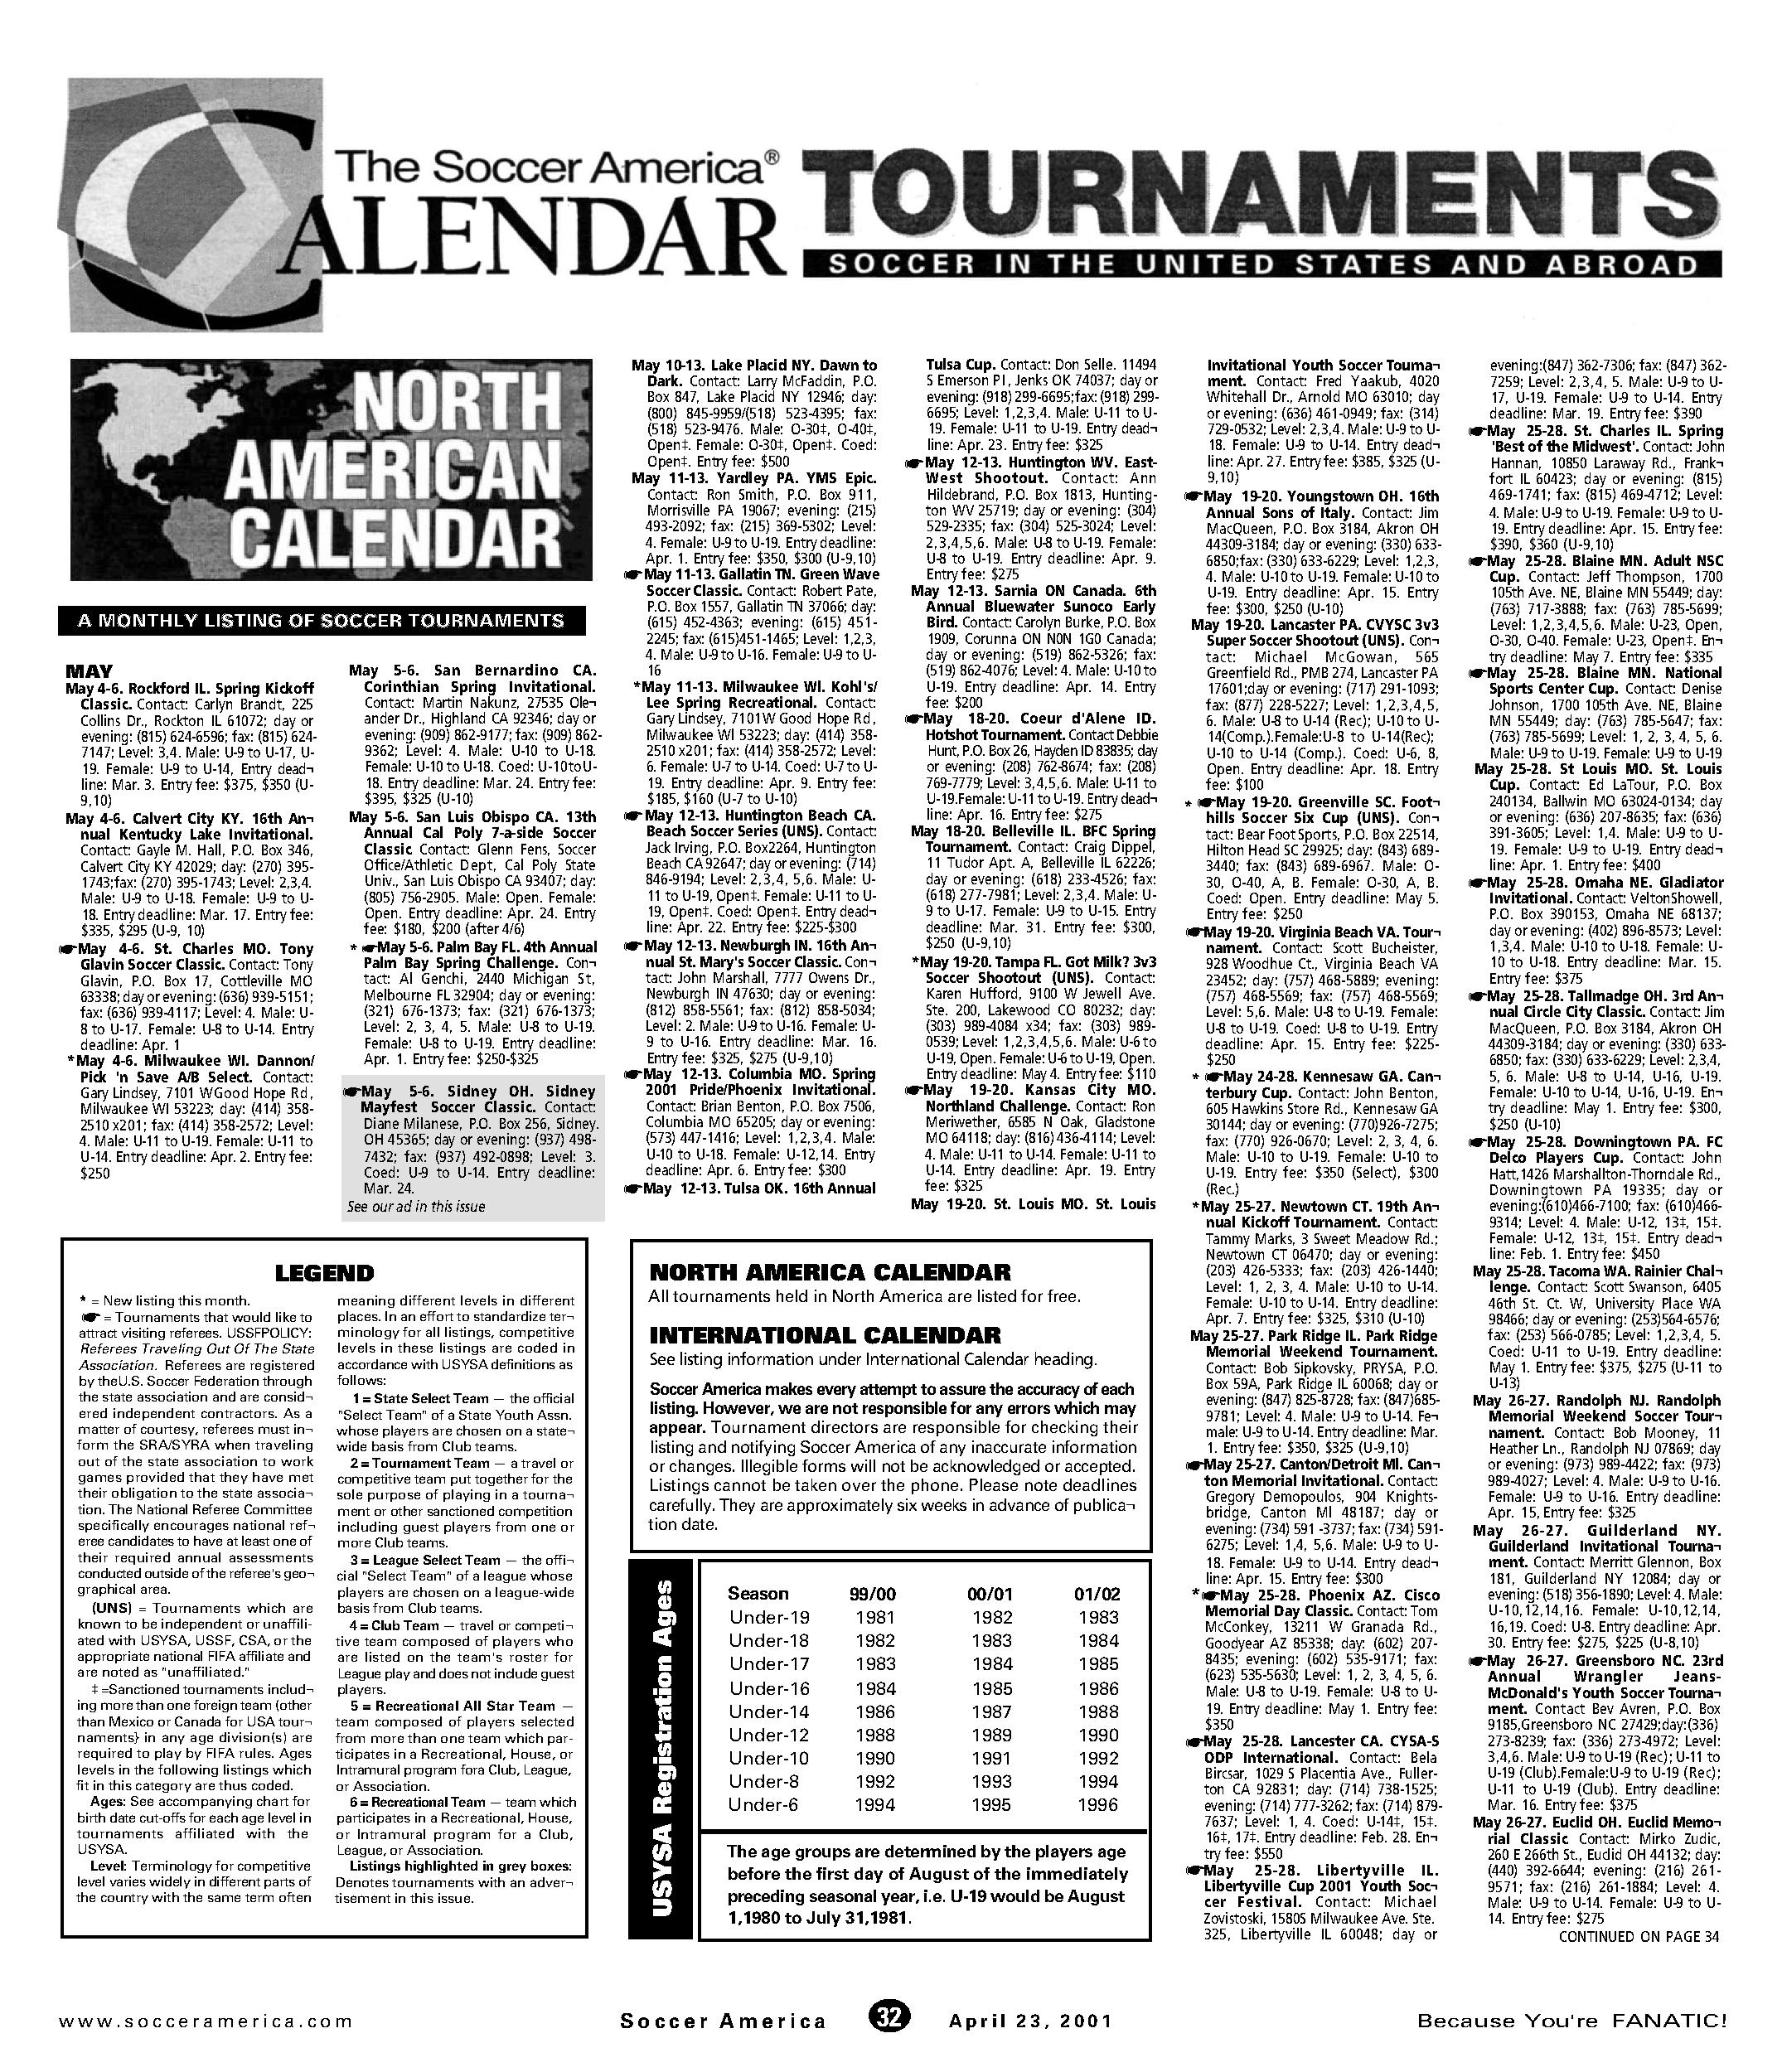 Soccer America Tournament Calendar - Sports Magazine Collection